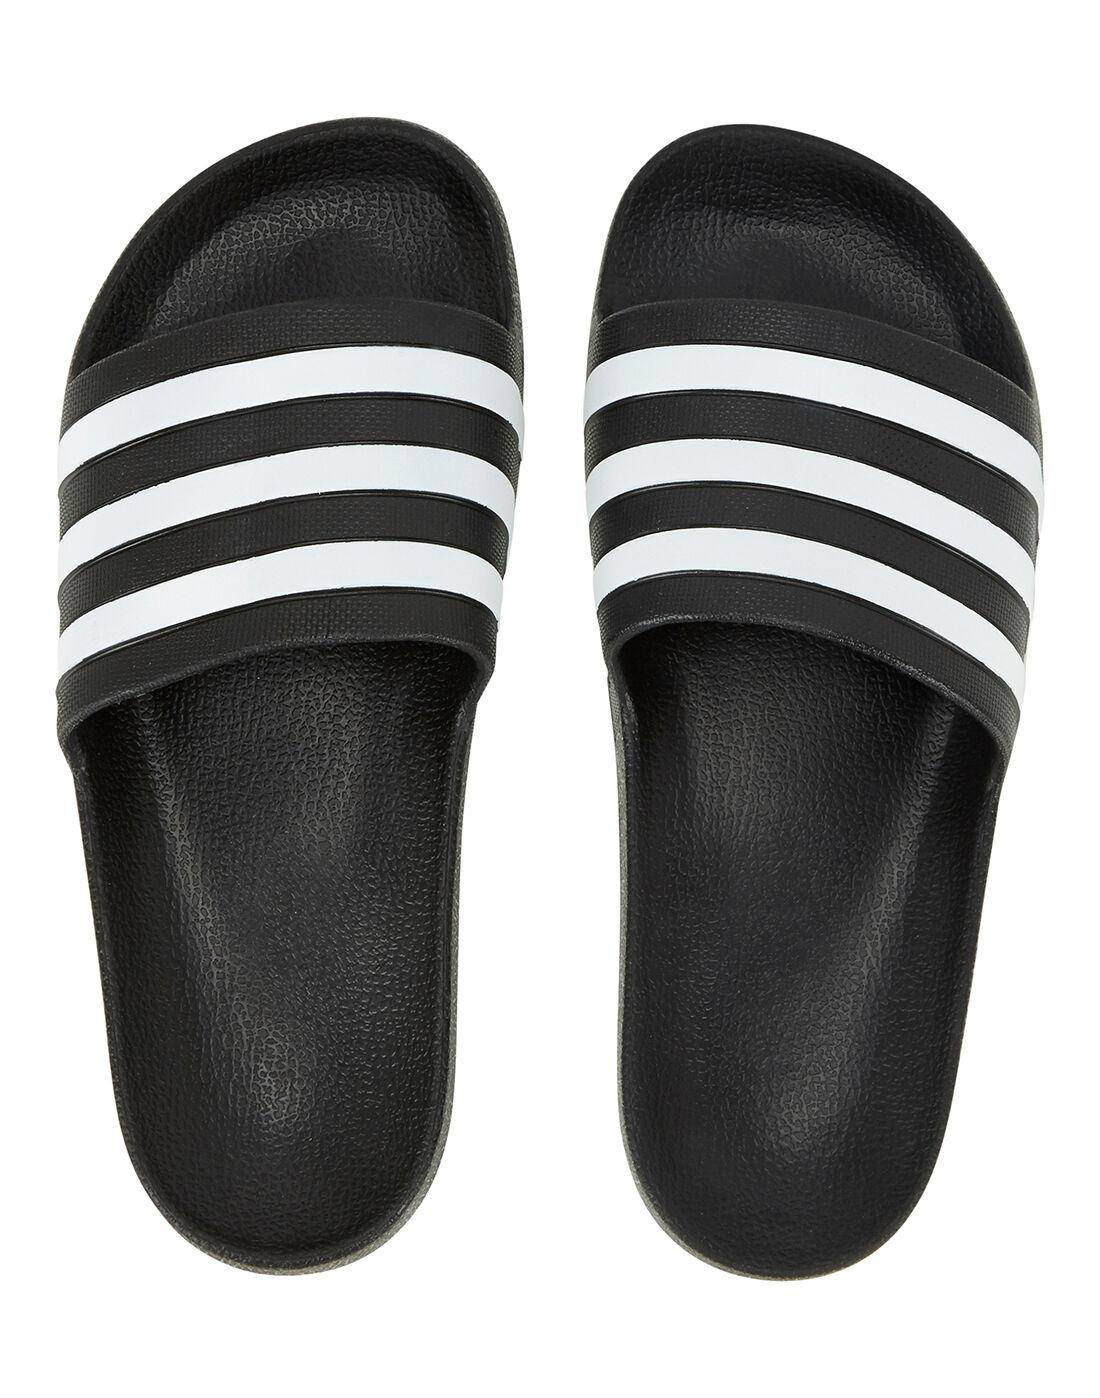 adidas adidas adipower olympic red boxing shoes size | Womens Adilette Aqua Slides